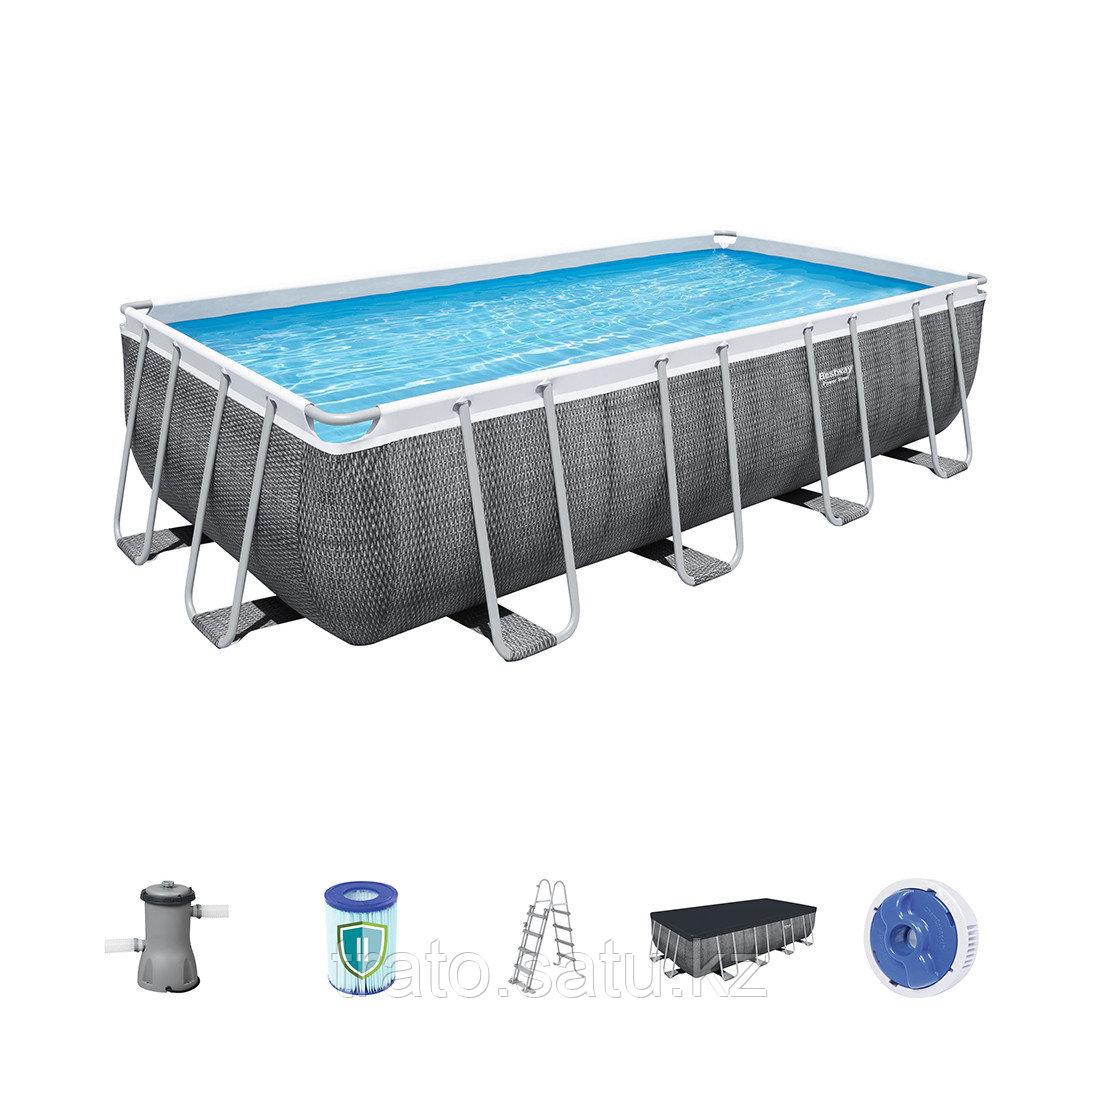 Каркасный бассейн Power Steel Rectangular 488х244х122 см  Ф-насос 3028л/ч, Лестница , Тент.